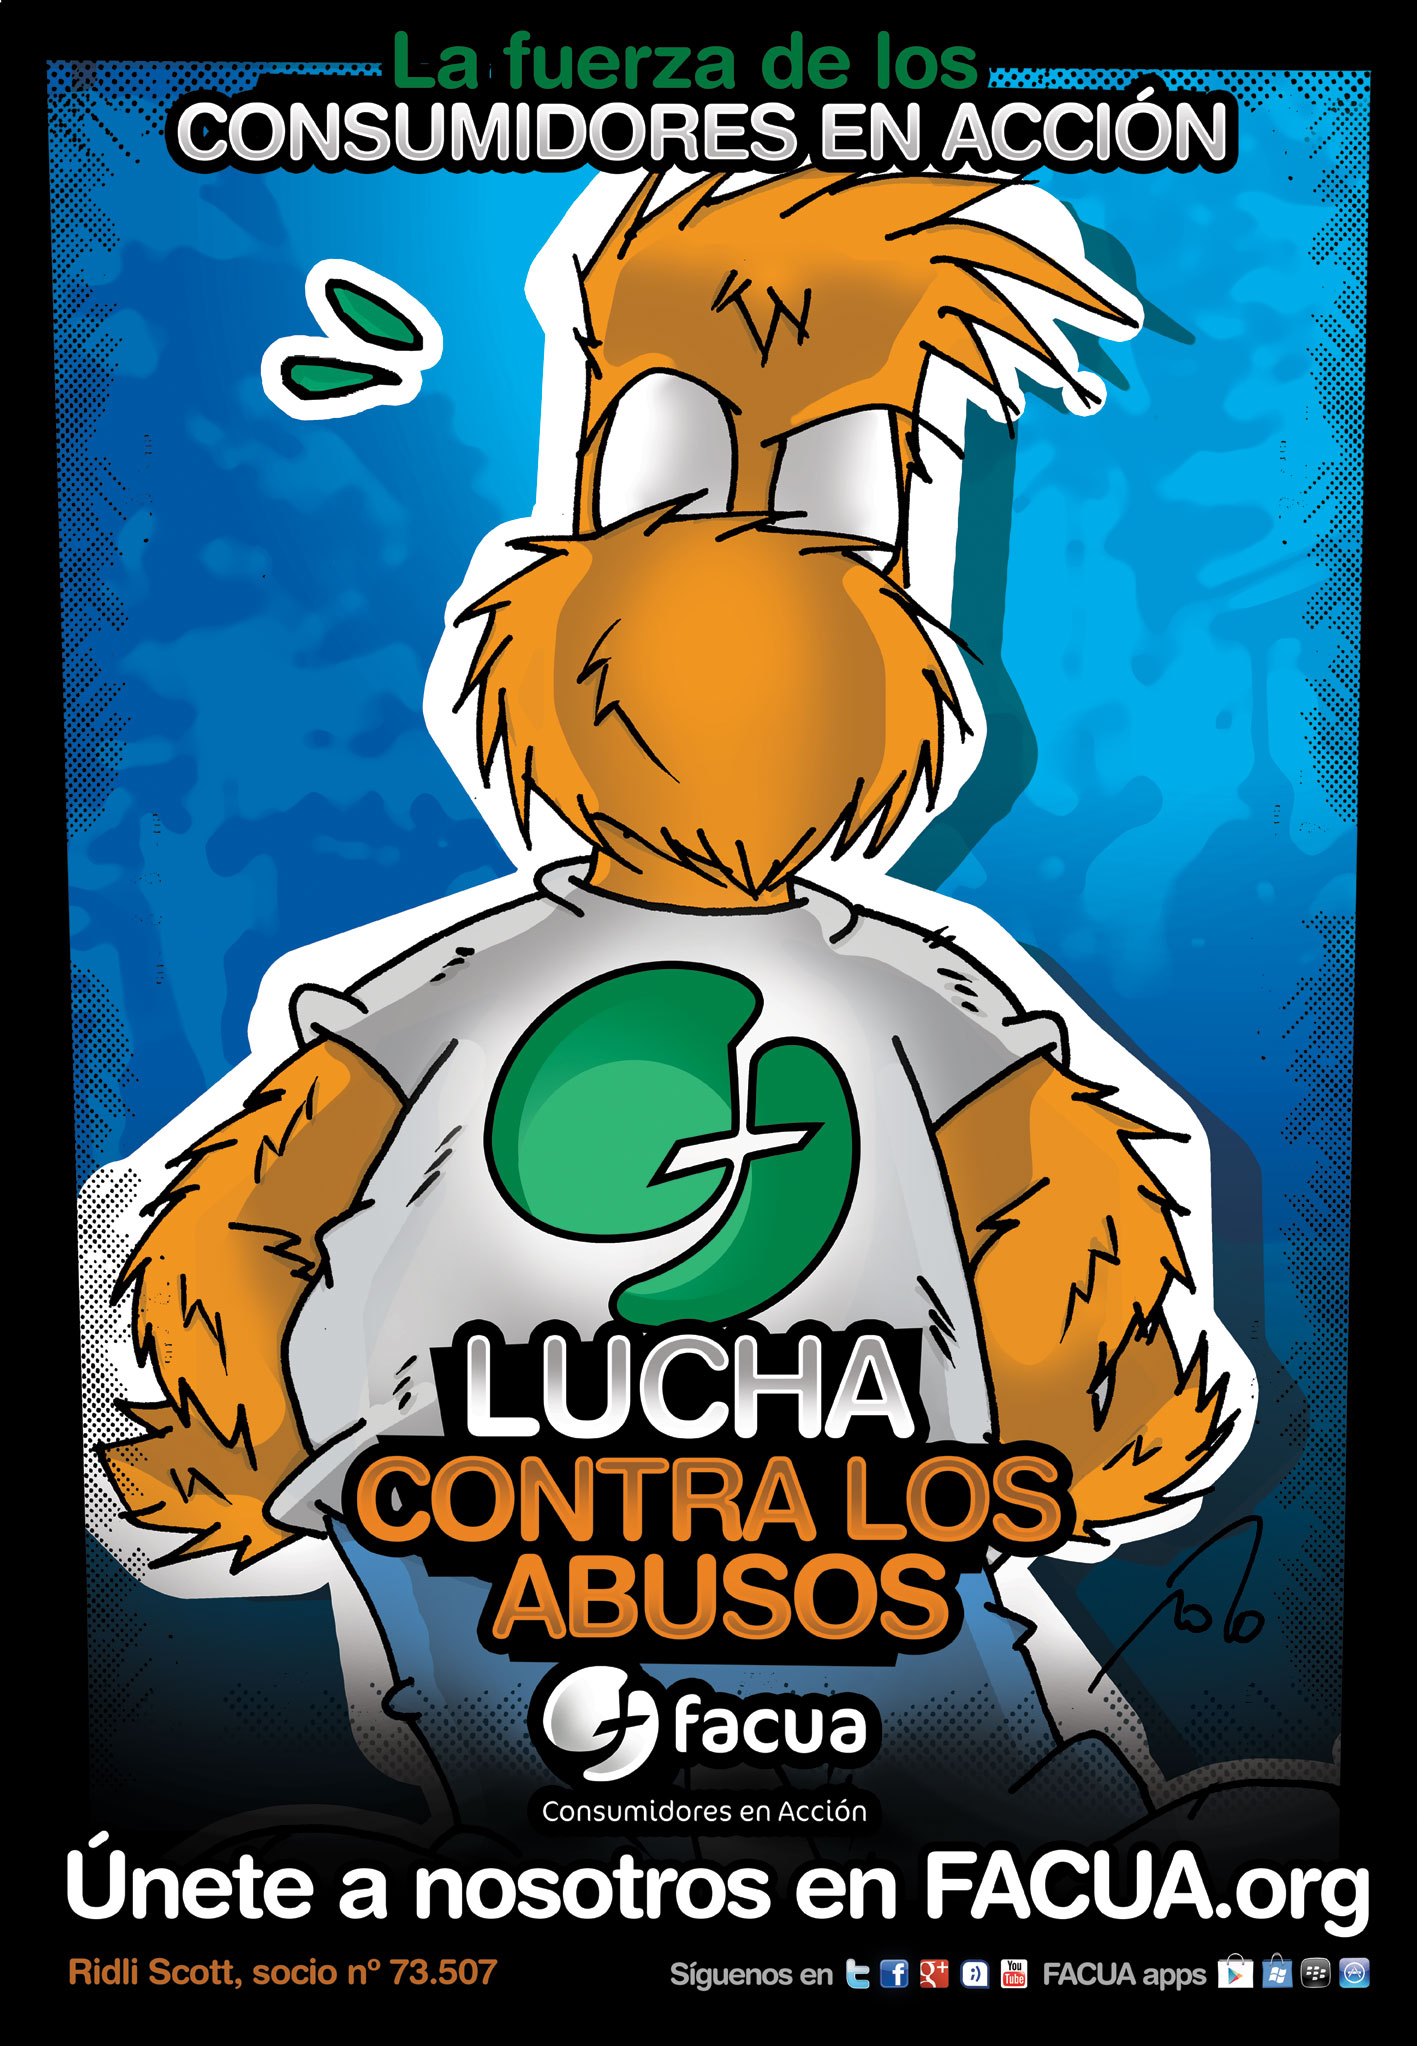 Ridli Scott, personaje del universo Fanhunter de Cels Piñol, se une a FACUA en la #luchacontralosabusos